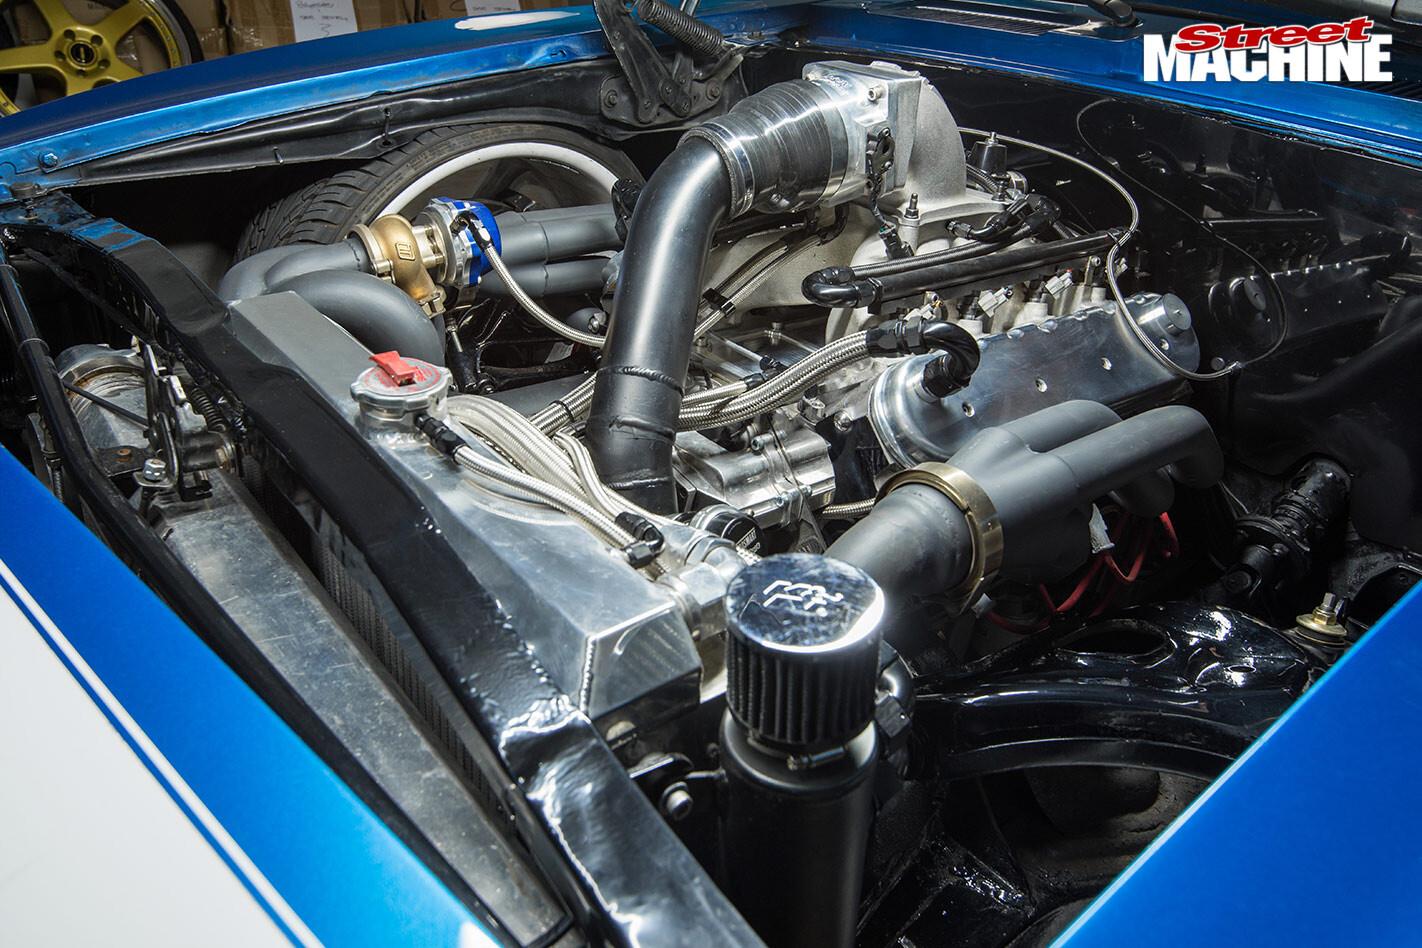 Camaro engine bay